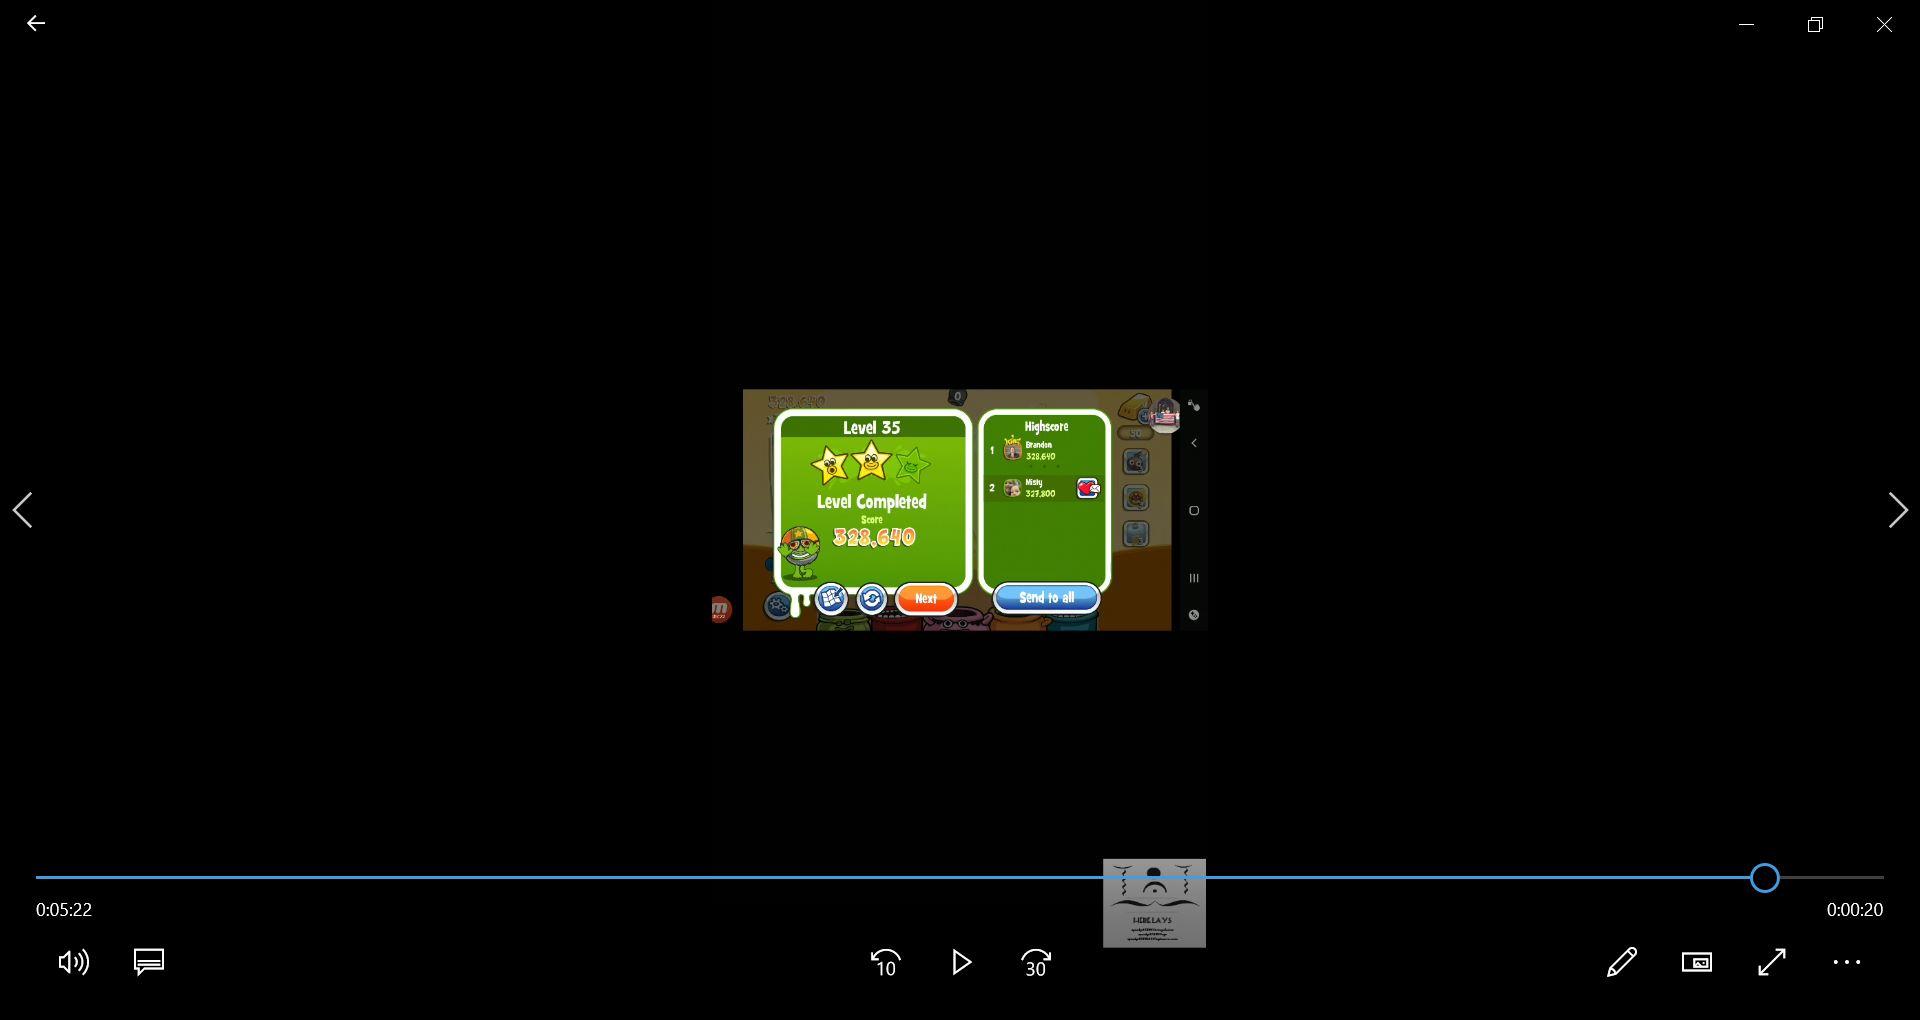 speedy4759123: Papa Pear Saga: Level 035 (Android) 328,640 points on 2020-03-19 12:17:52